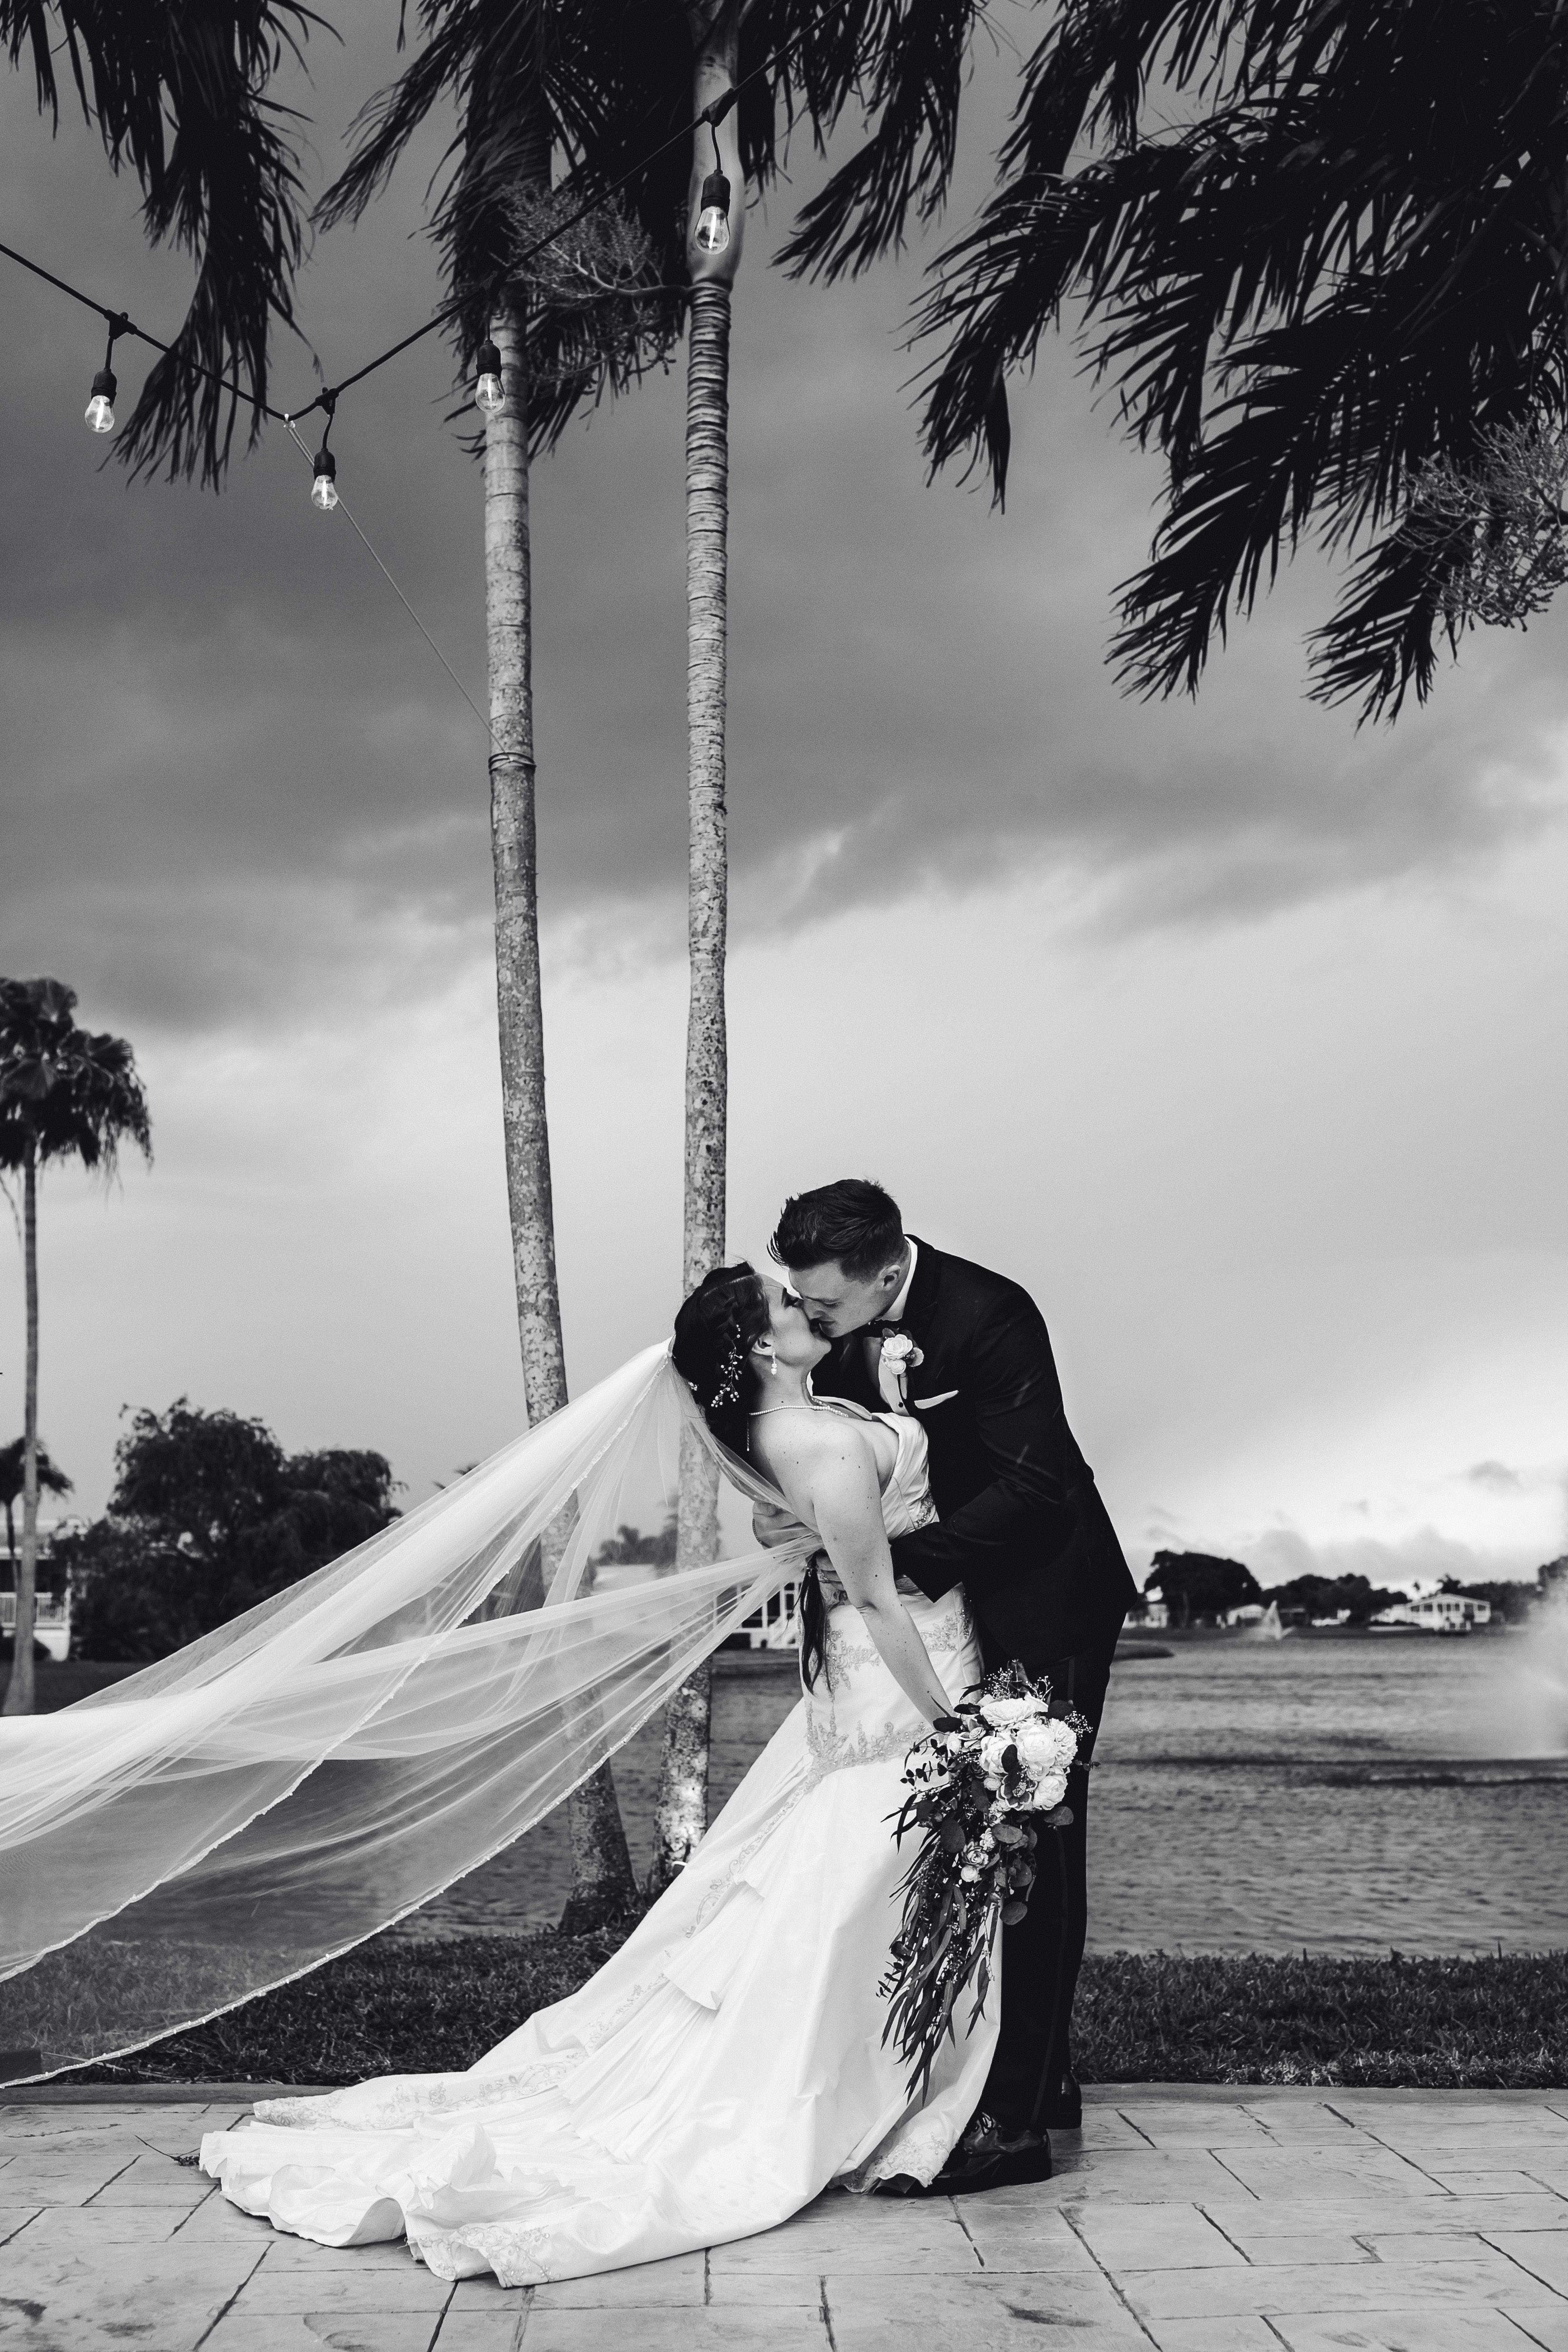 Emotional Wedding Photography South Florida Wedding And Elopement Ph In 2020 Emotional Wedding Photography Florida Wedding Photographer Intimate Wedding Photographer